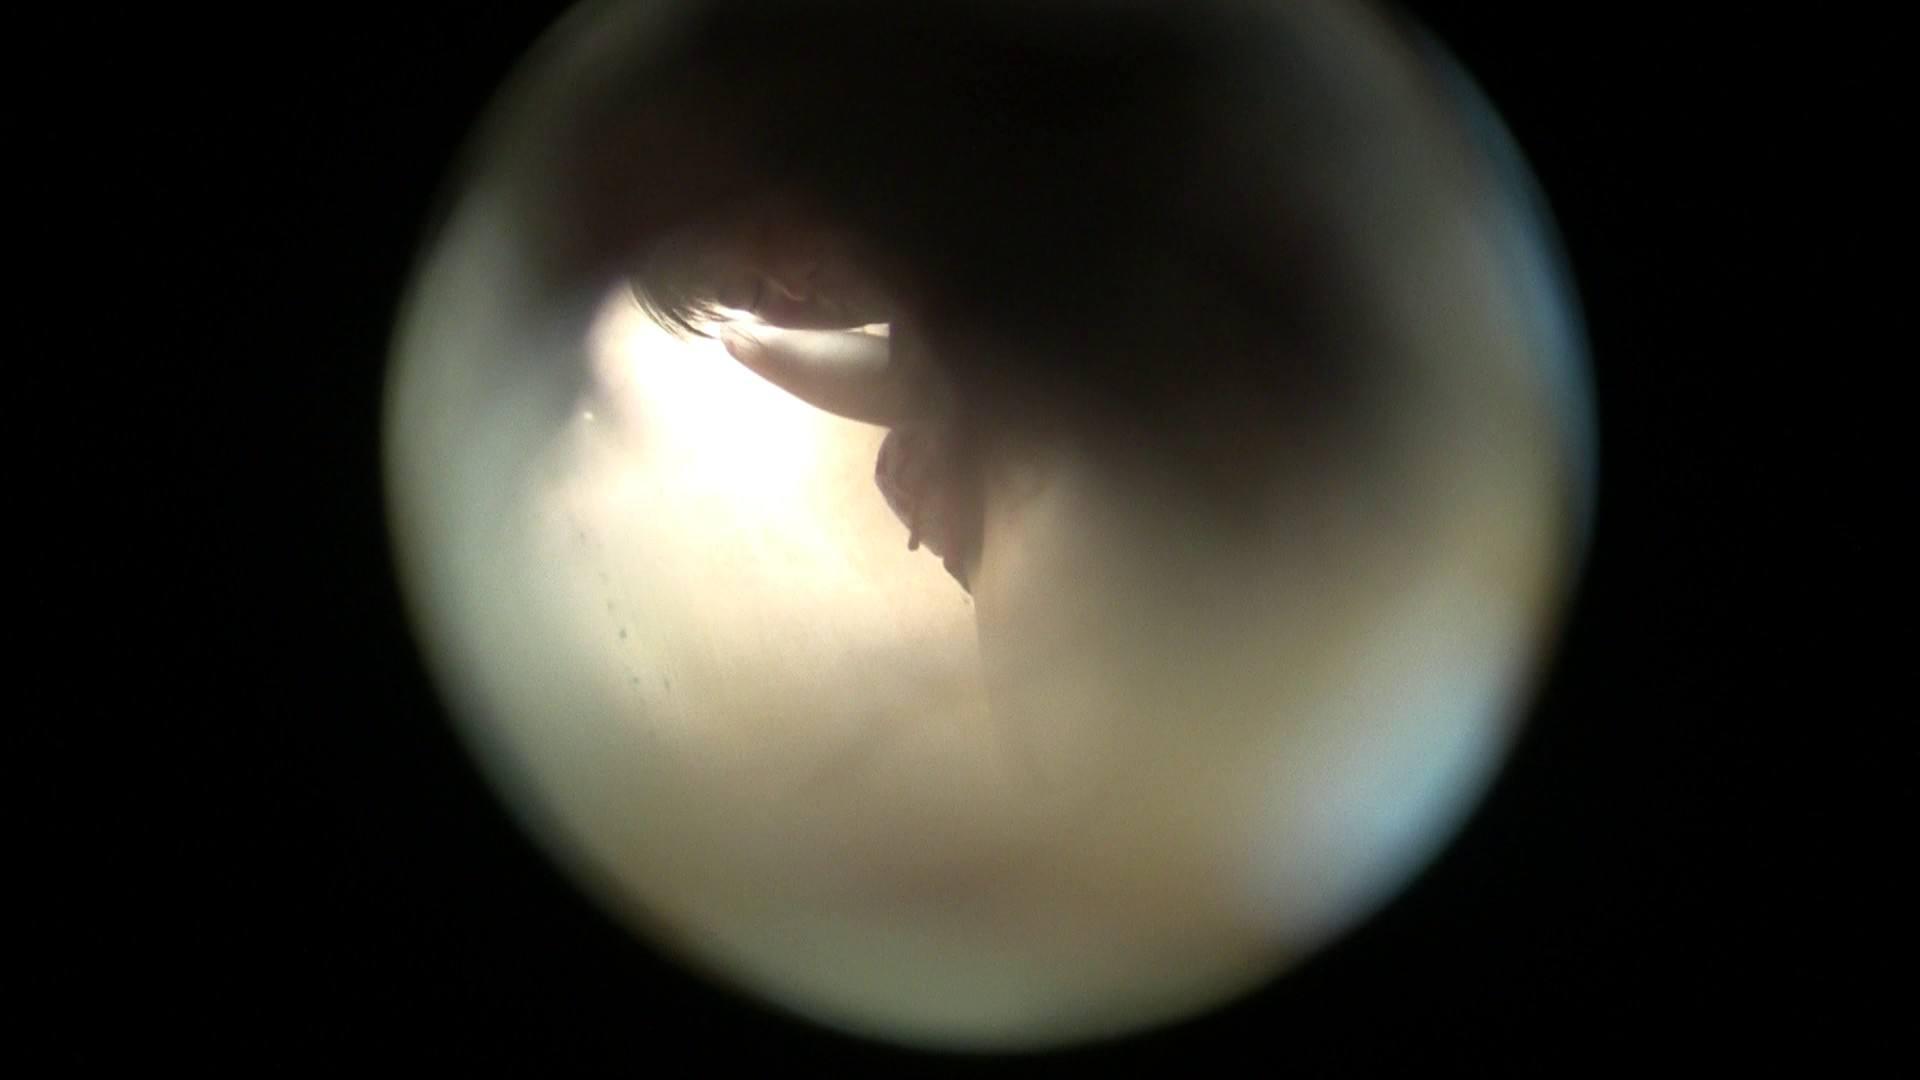 NO.08 貧乳にハートのブラ 覗き 濡れ場動画紹介 51画像 47